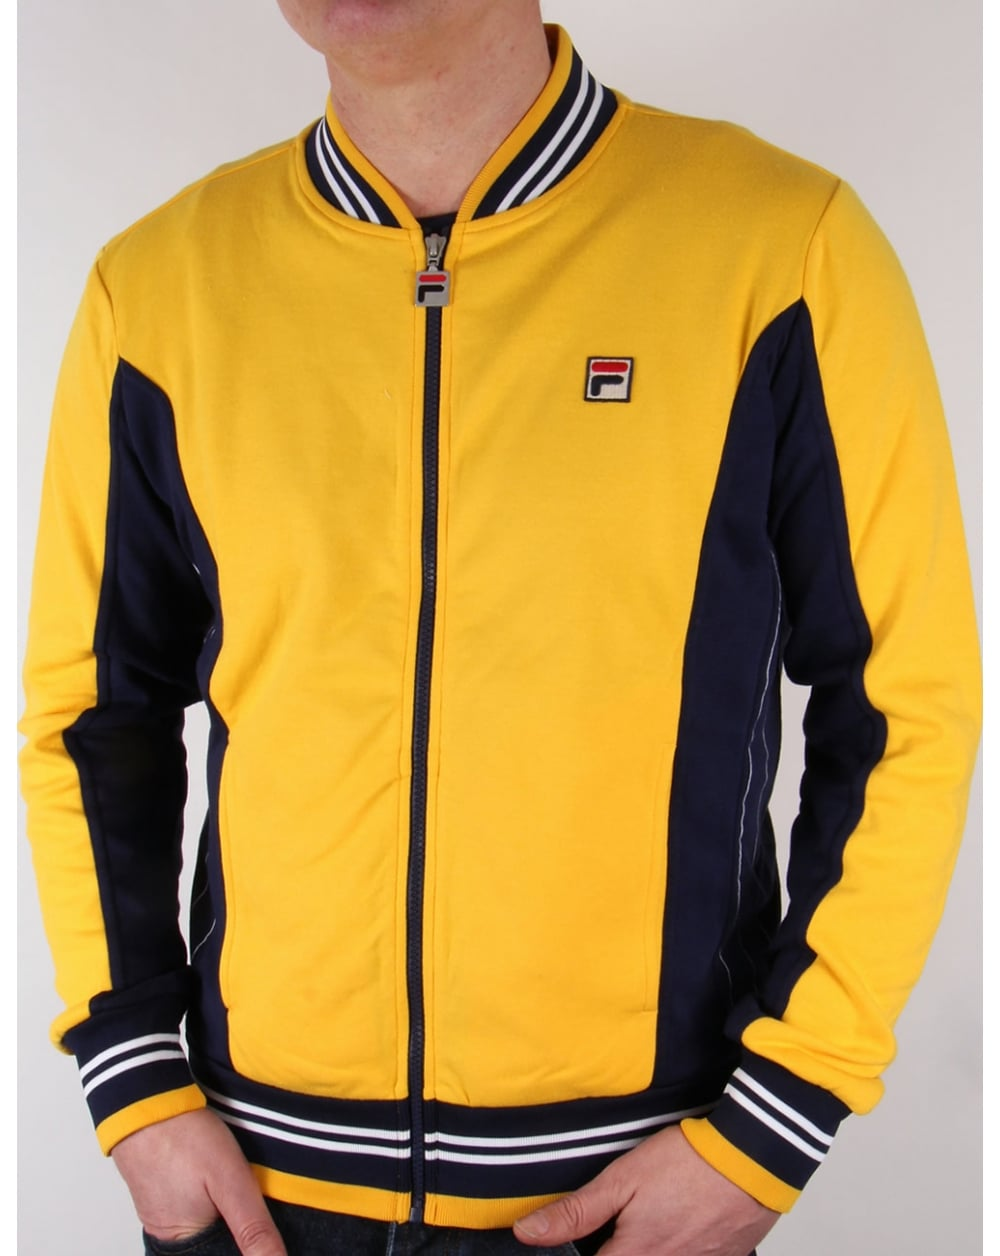 77c2cacc7dce Fila Vintage Mk1 Settanta Track Top Yellow/navy,tracksuit,jacket,mens